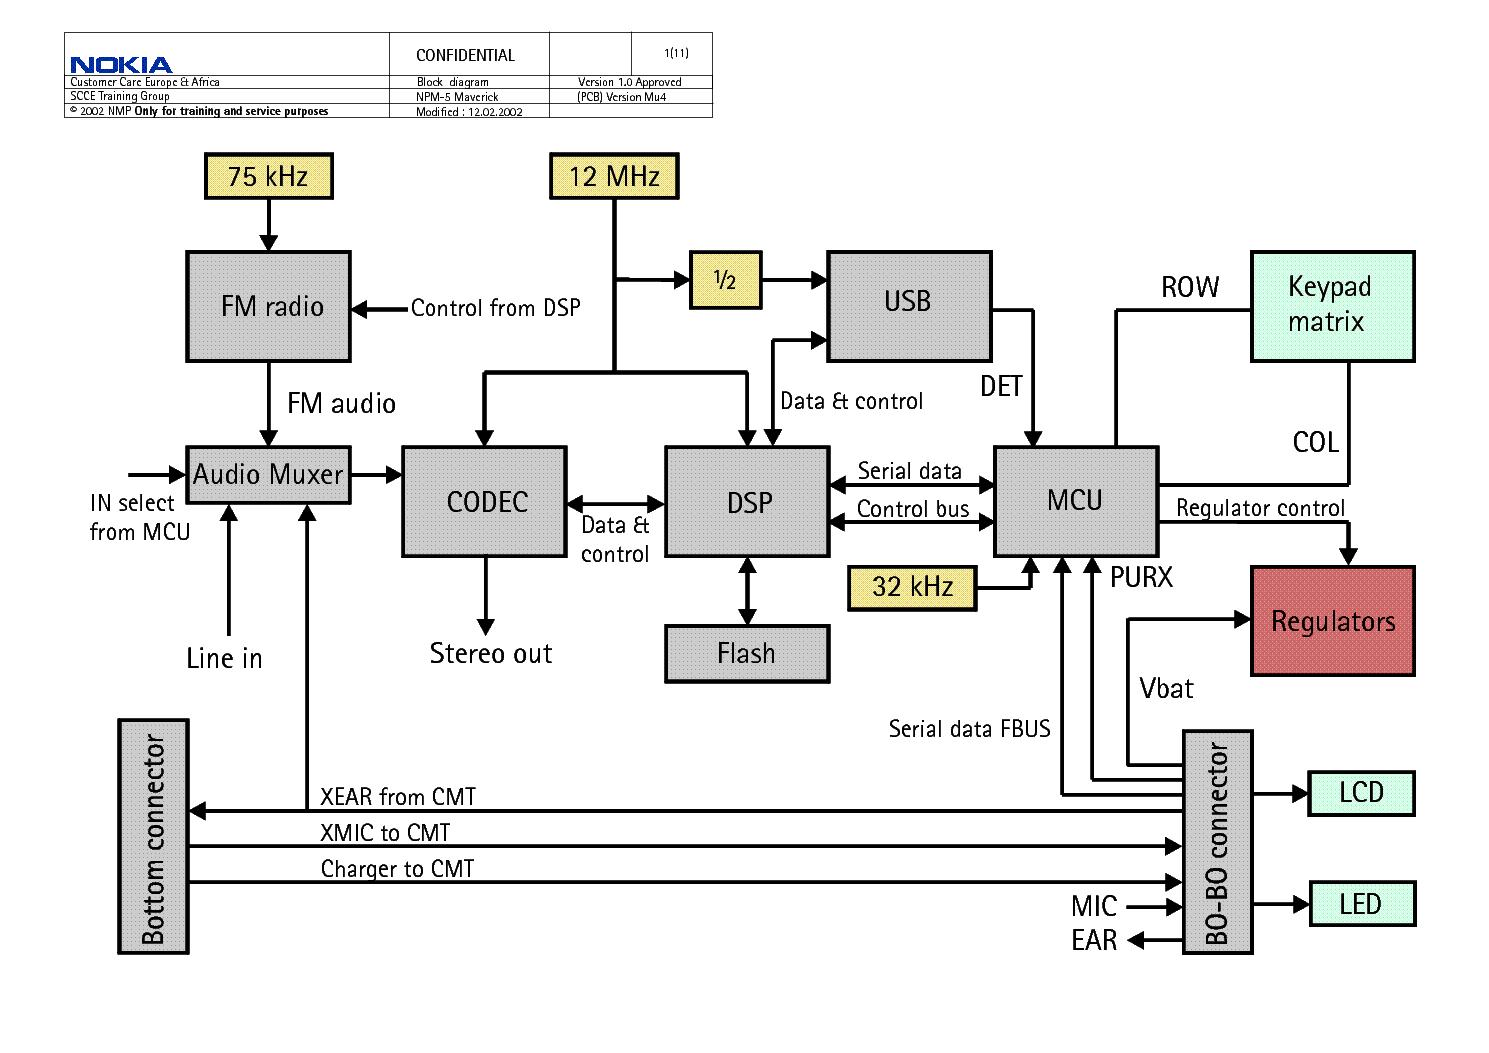 Nokia Circuit Diagram Book Wiring Diagrams Basicwiring2wireswitchedplugbjpg Pdf Car Explained U2022 Rh Ethermag Co Symbols